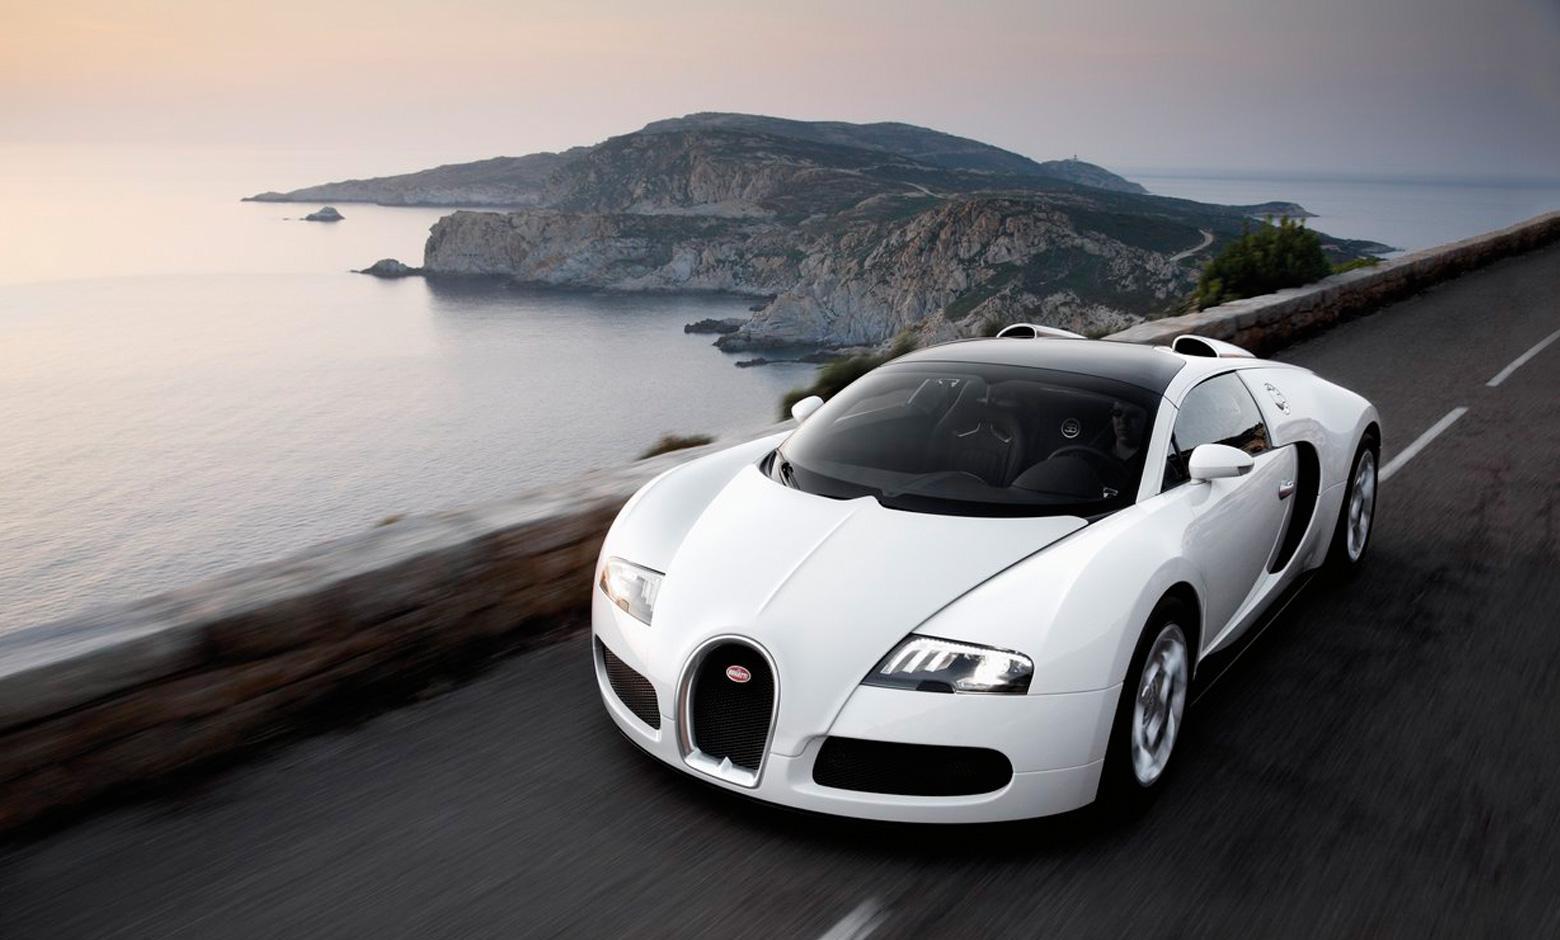 bugatti veyron handling speed gta5. Black Bedroom Furniture Sets. Home Design Ideas